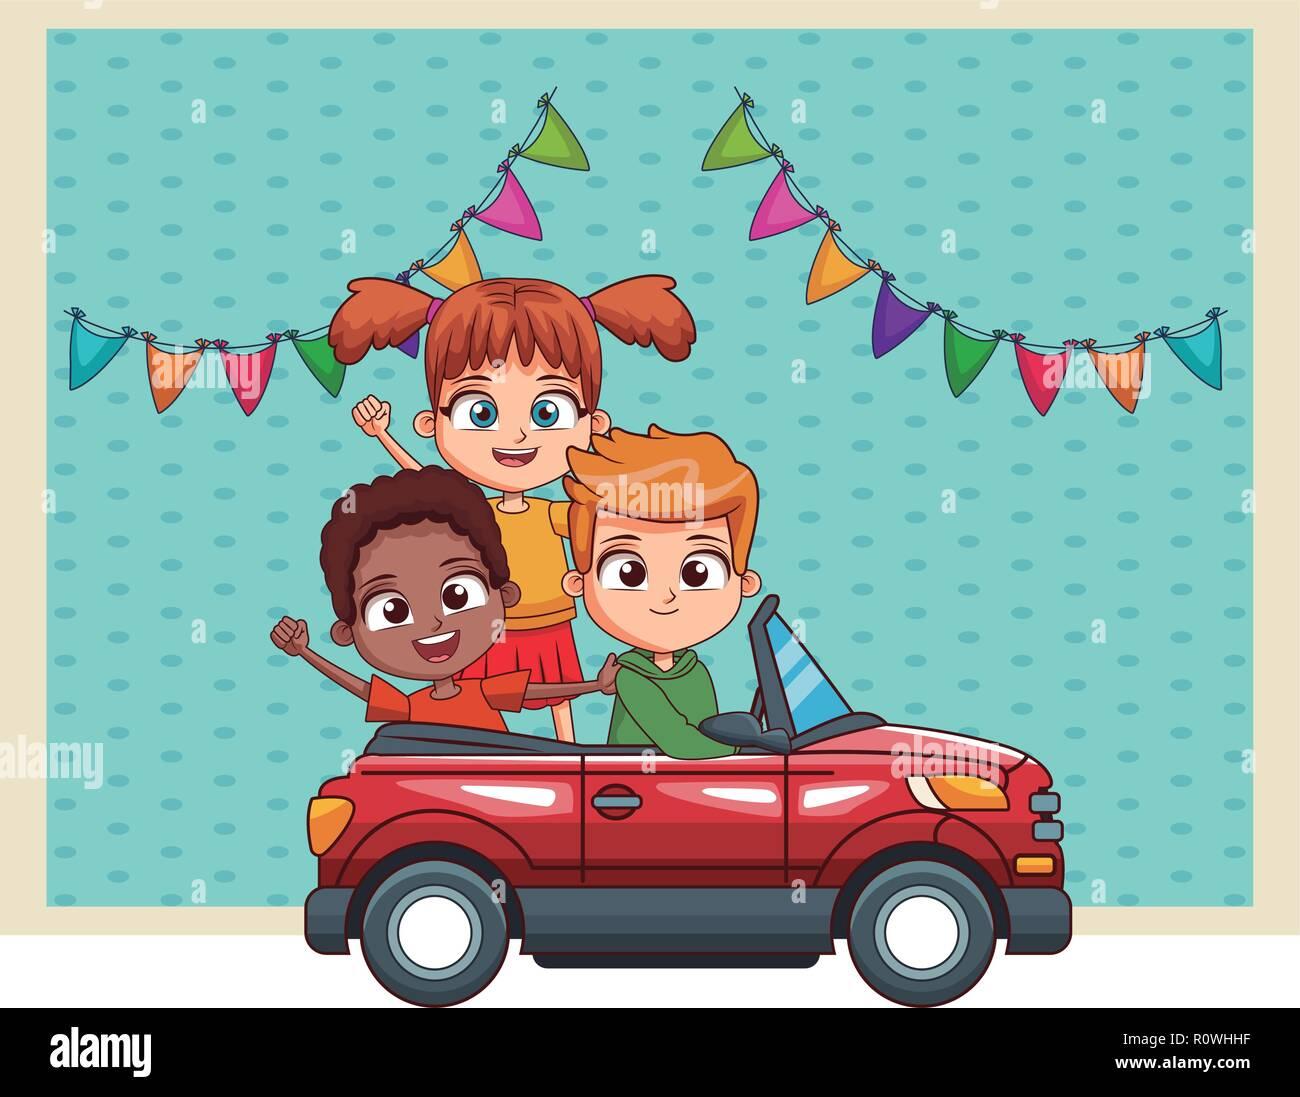 Three Kids Driving Car Cartoon Stock Vector Image Art Alamy